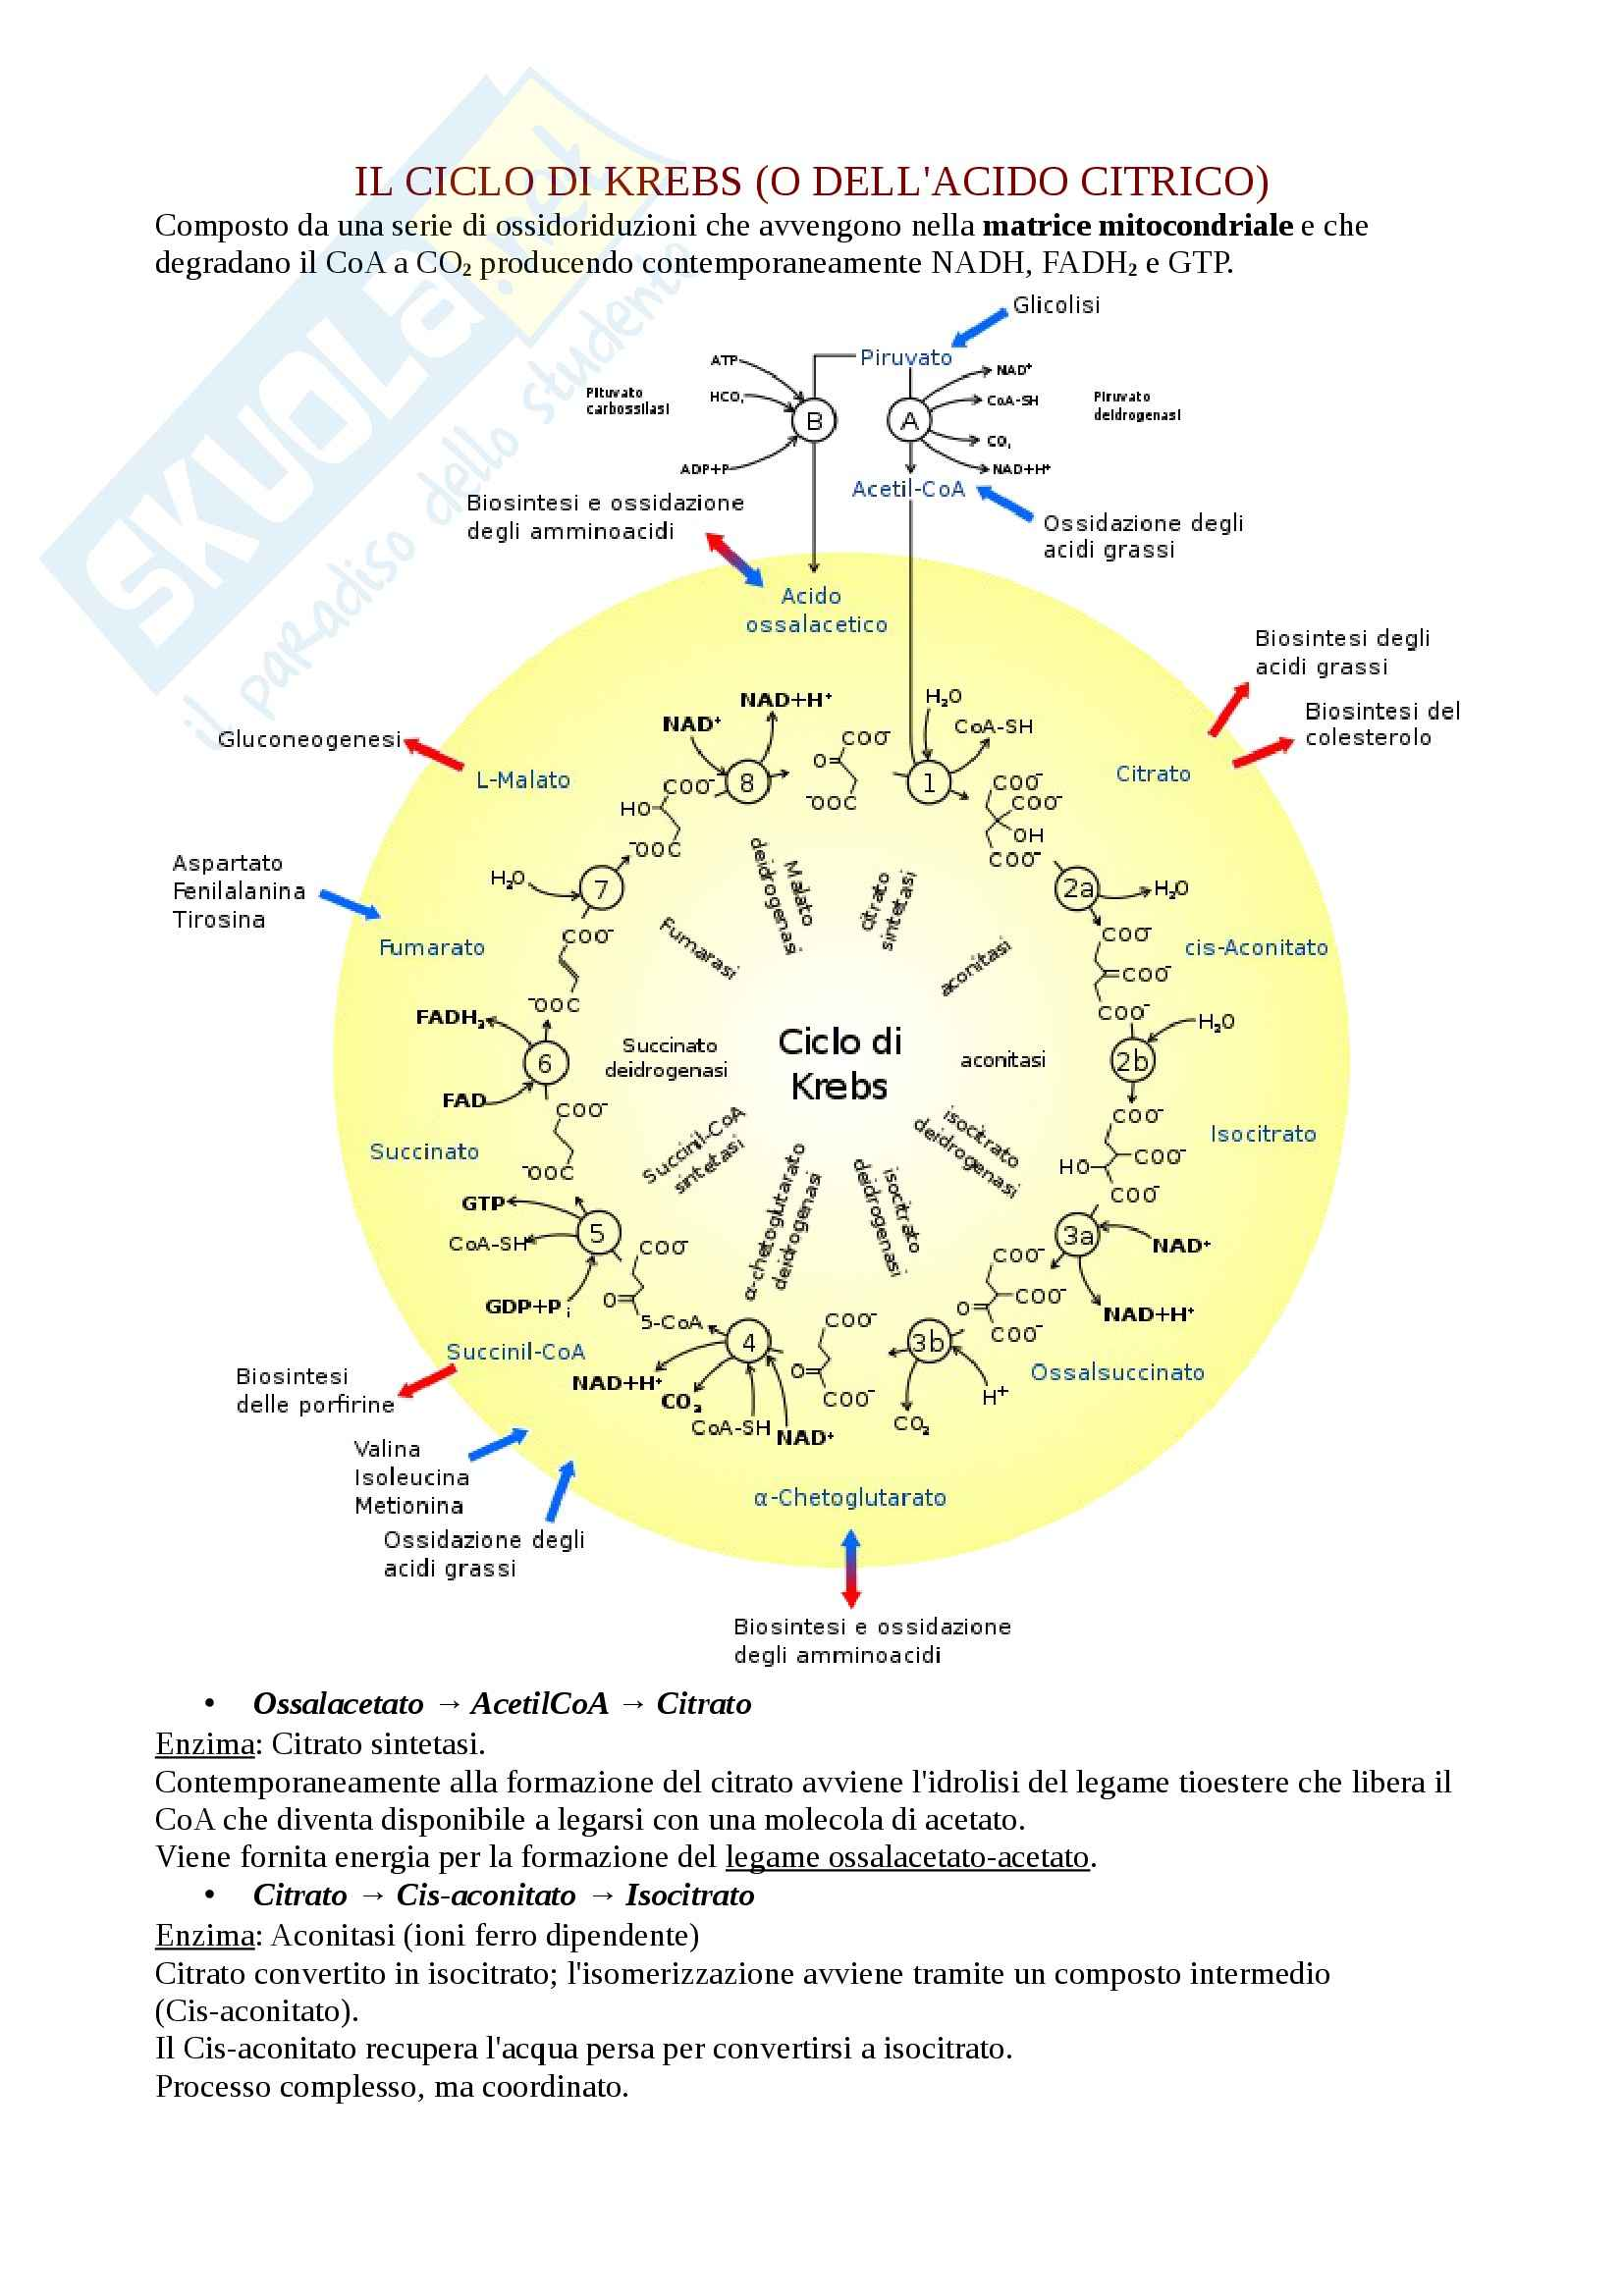 Ciclo di Krebs, Basi biologiche